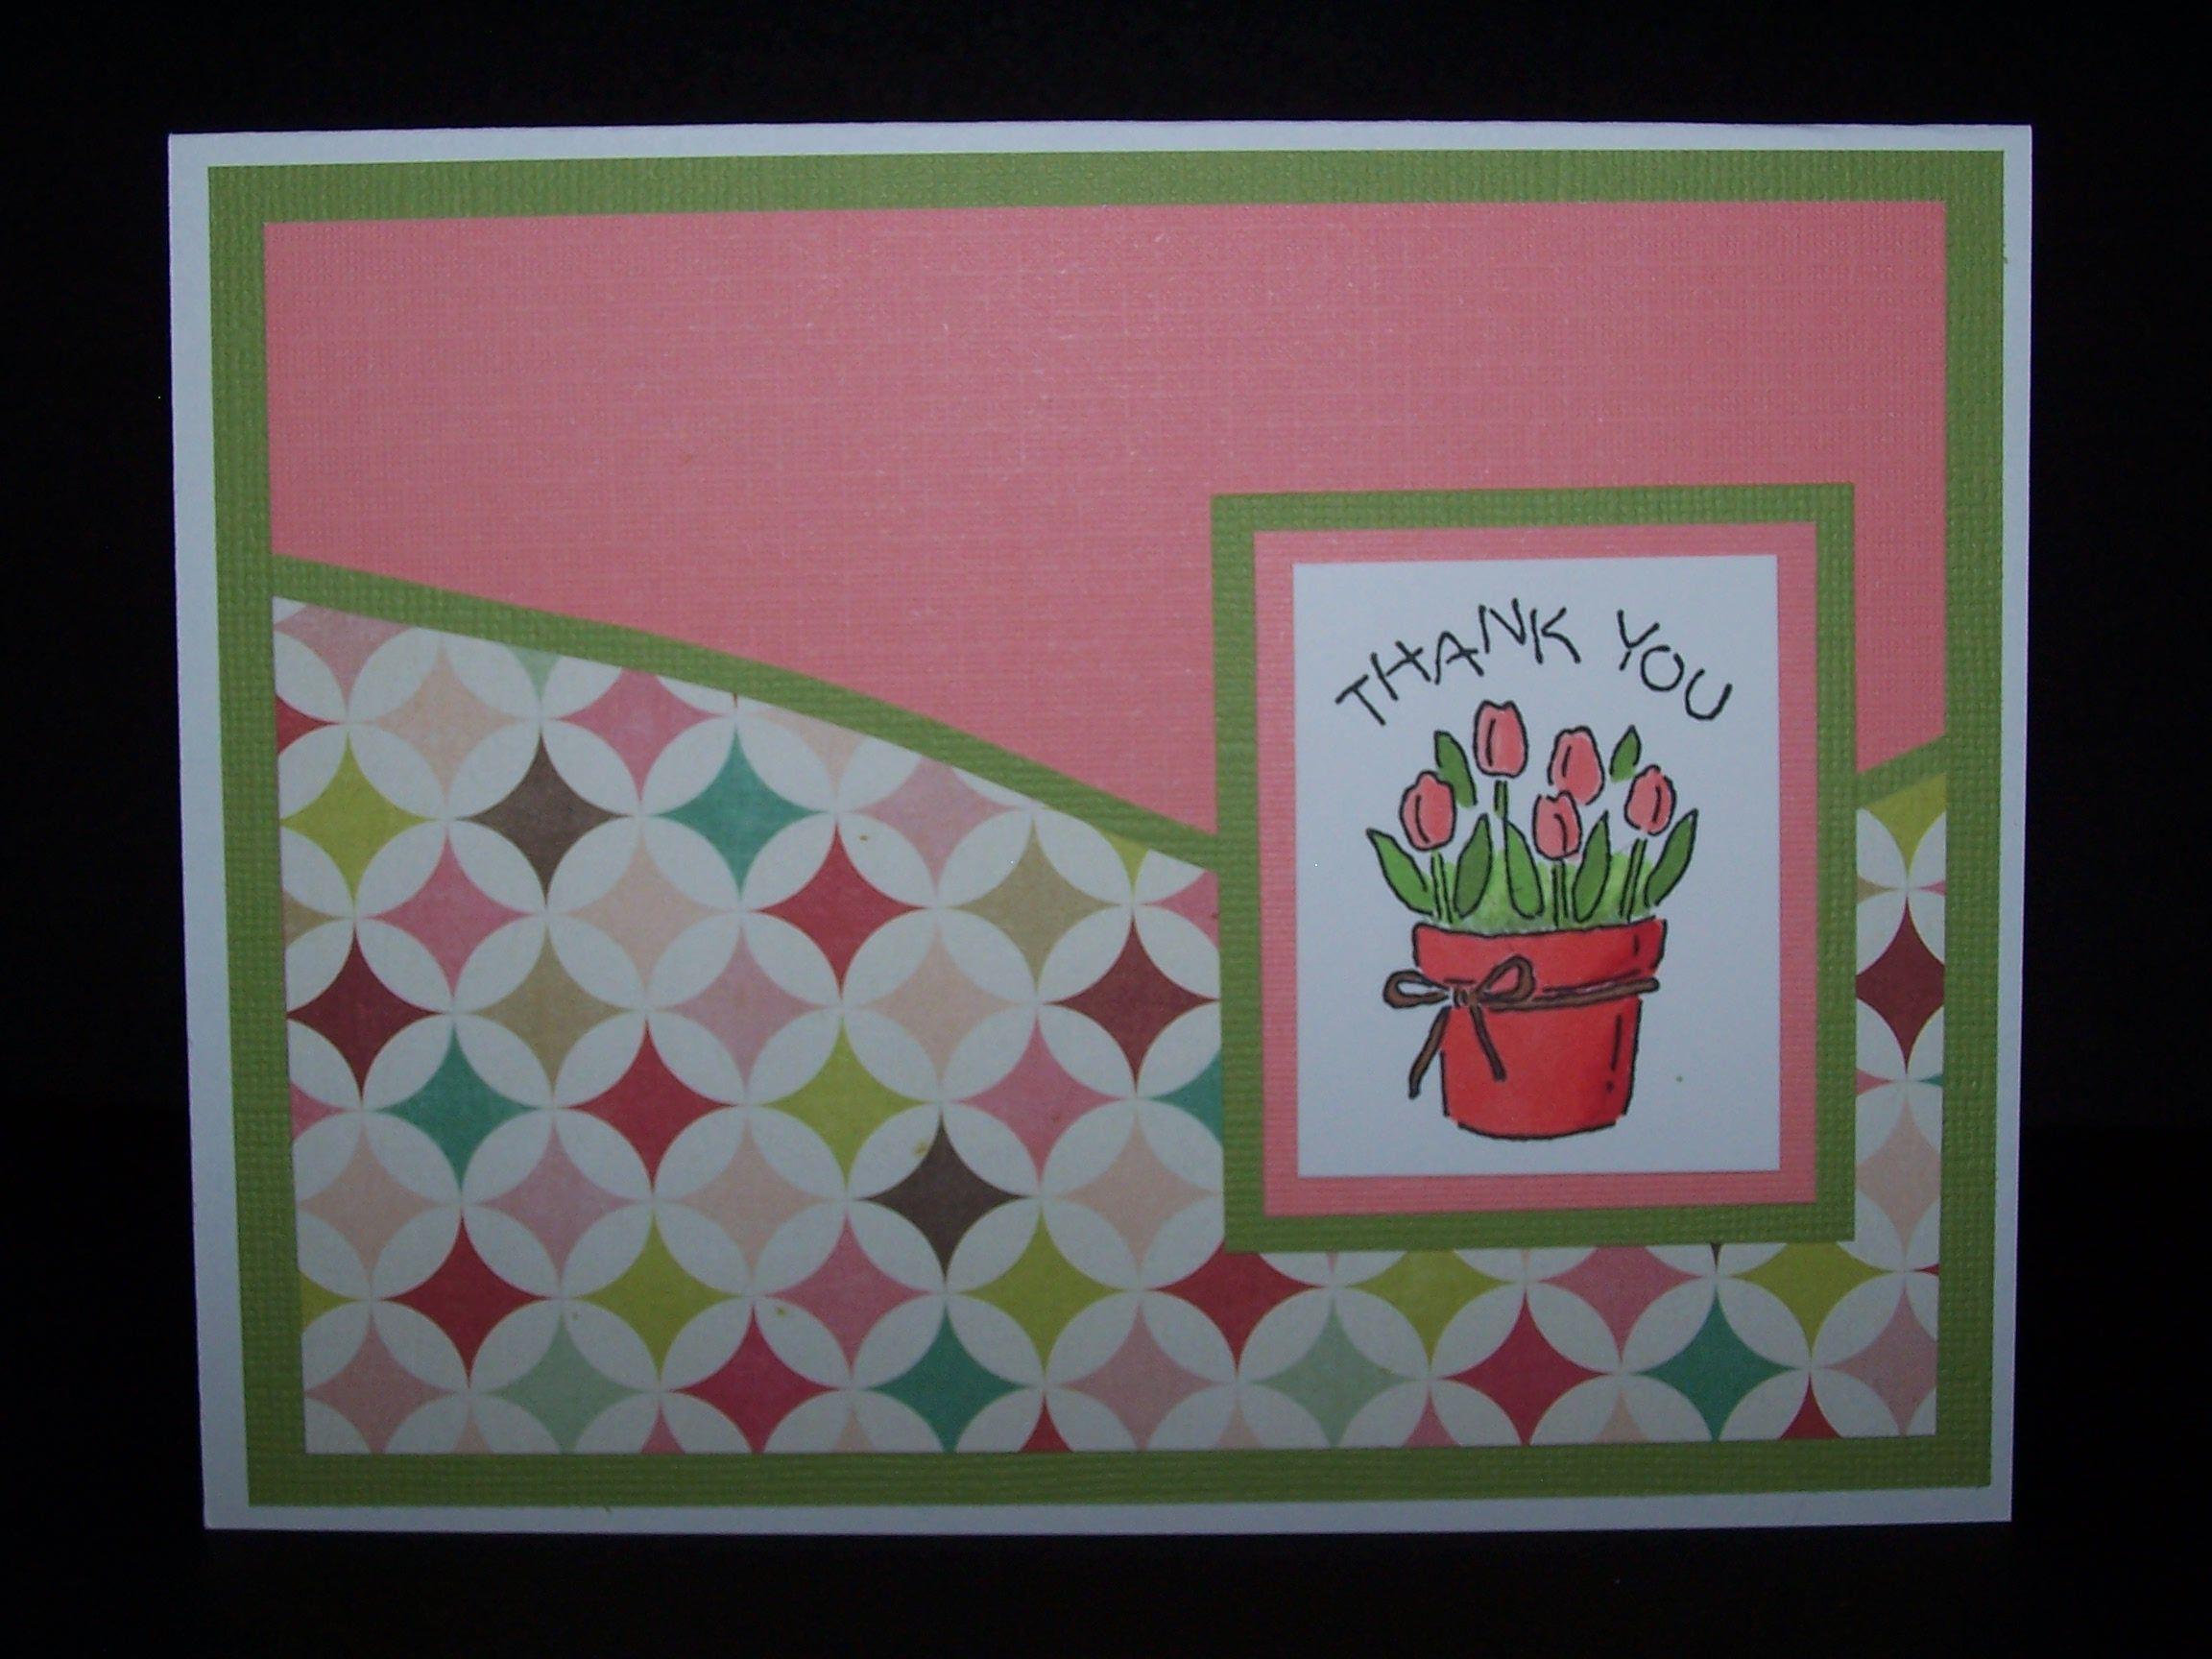 Perky Card Stampin Up Easy Notes Card Stampin Up Easy Notes Cards I Have Made Pinterest Easy Note Cards Exercise 38 Easy Note Cards Chapter 12